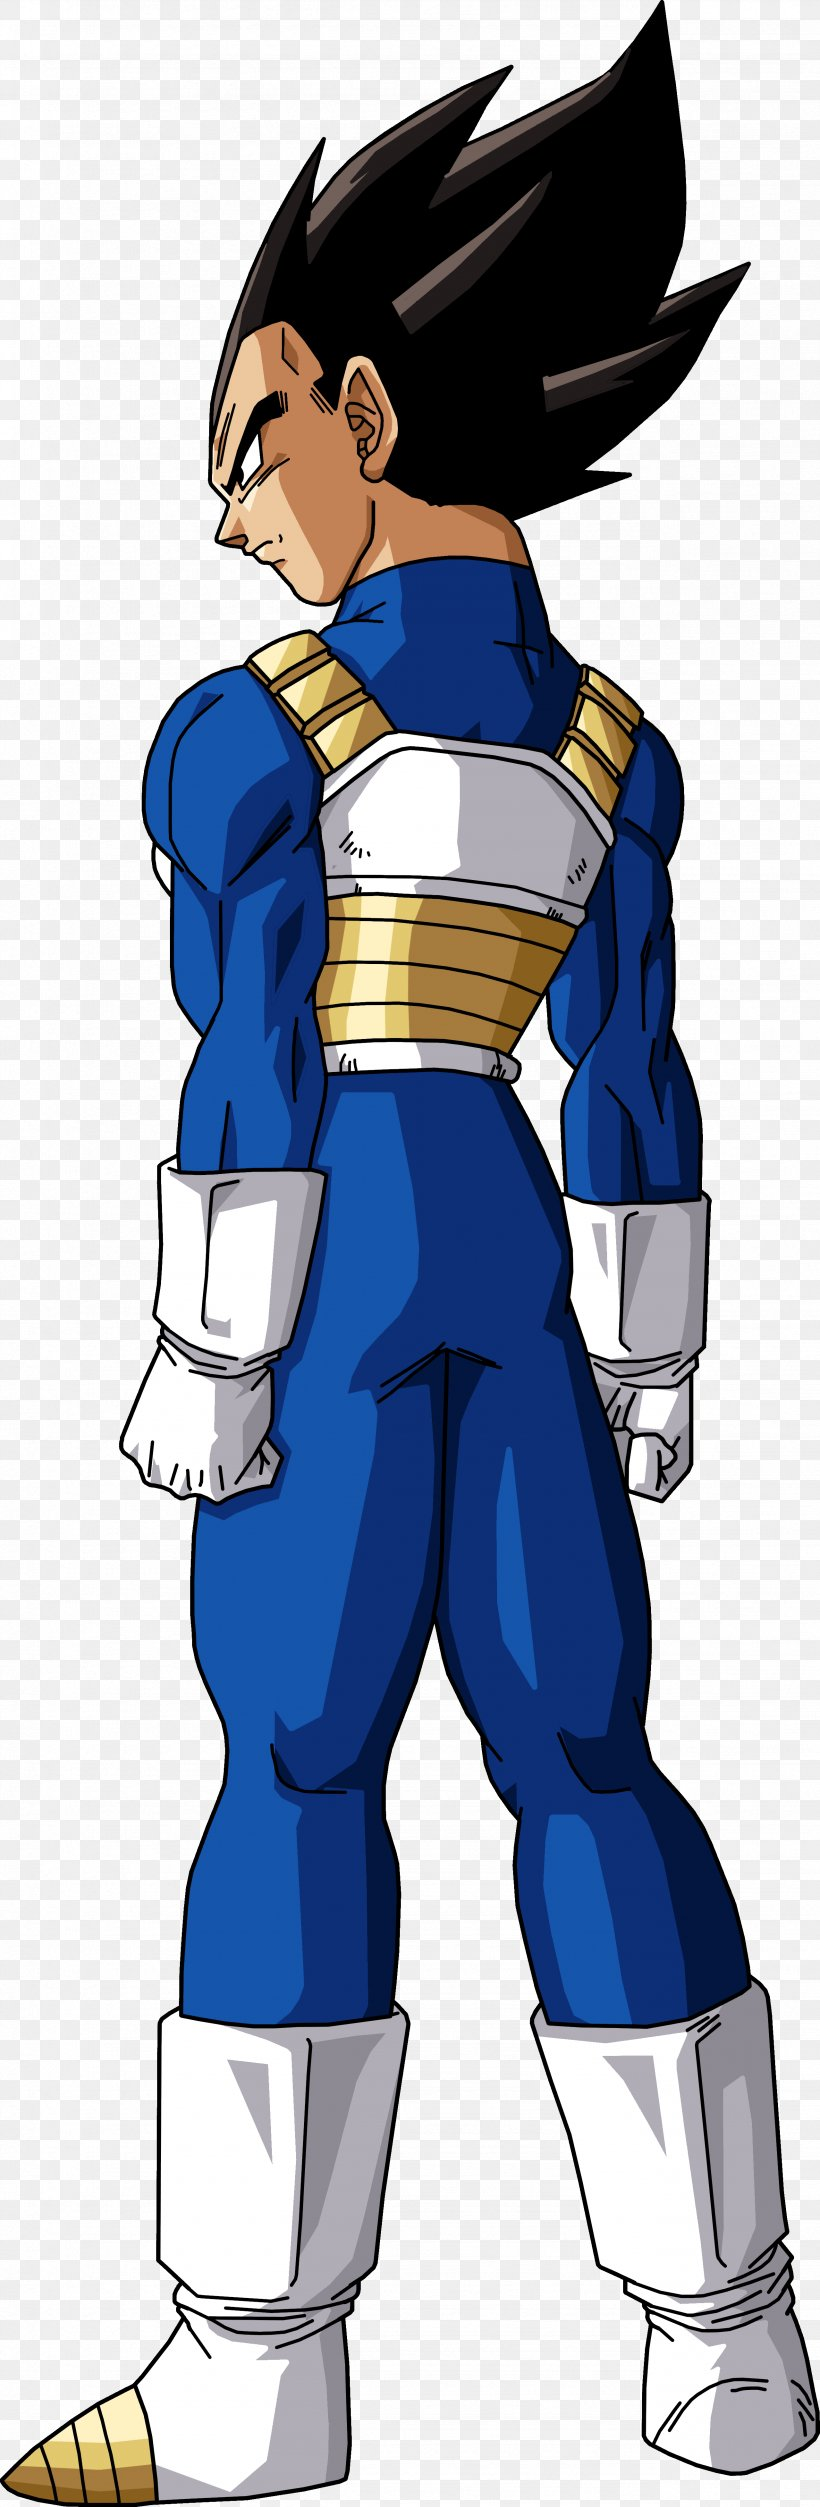 Vegeta Goku Frieza Gohan Gotenks, PNG, 2557x7820px, Vegeta, Cartoon, Deviantart, Dragon Ball, Dragon Ball Super Download Free